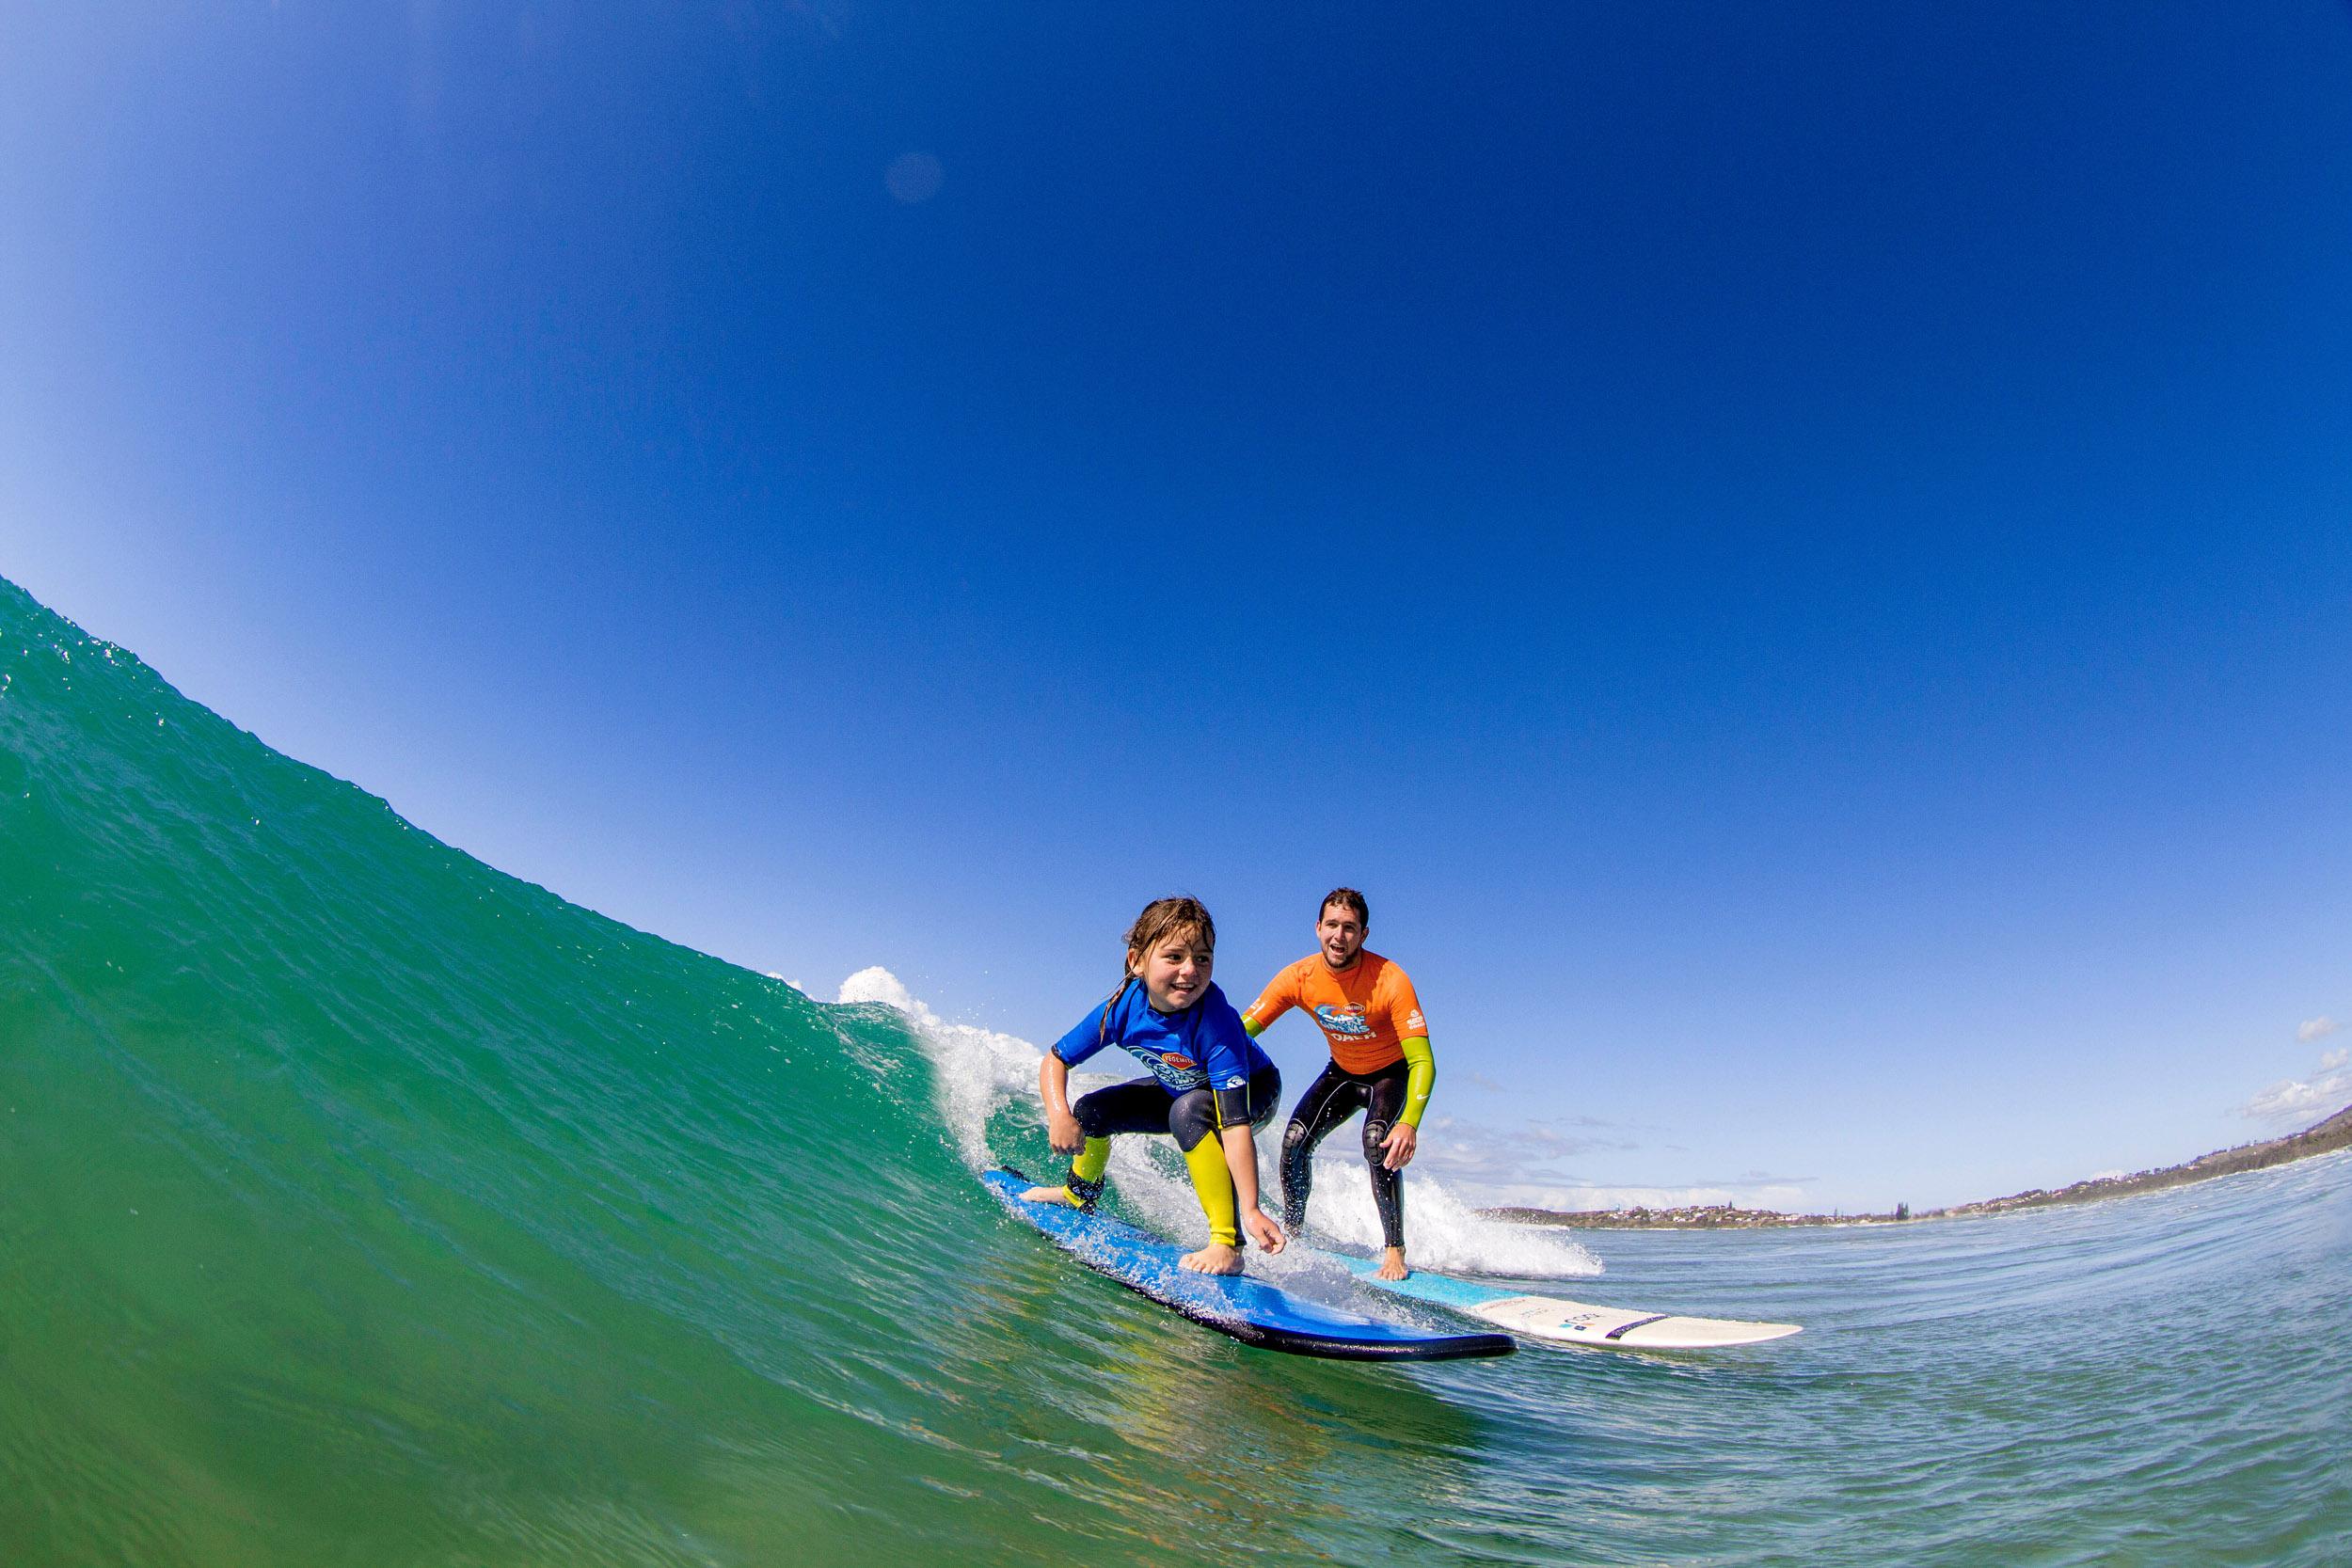 surfing-australia-surf-groms-photography-352.jpg